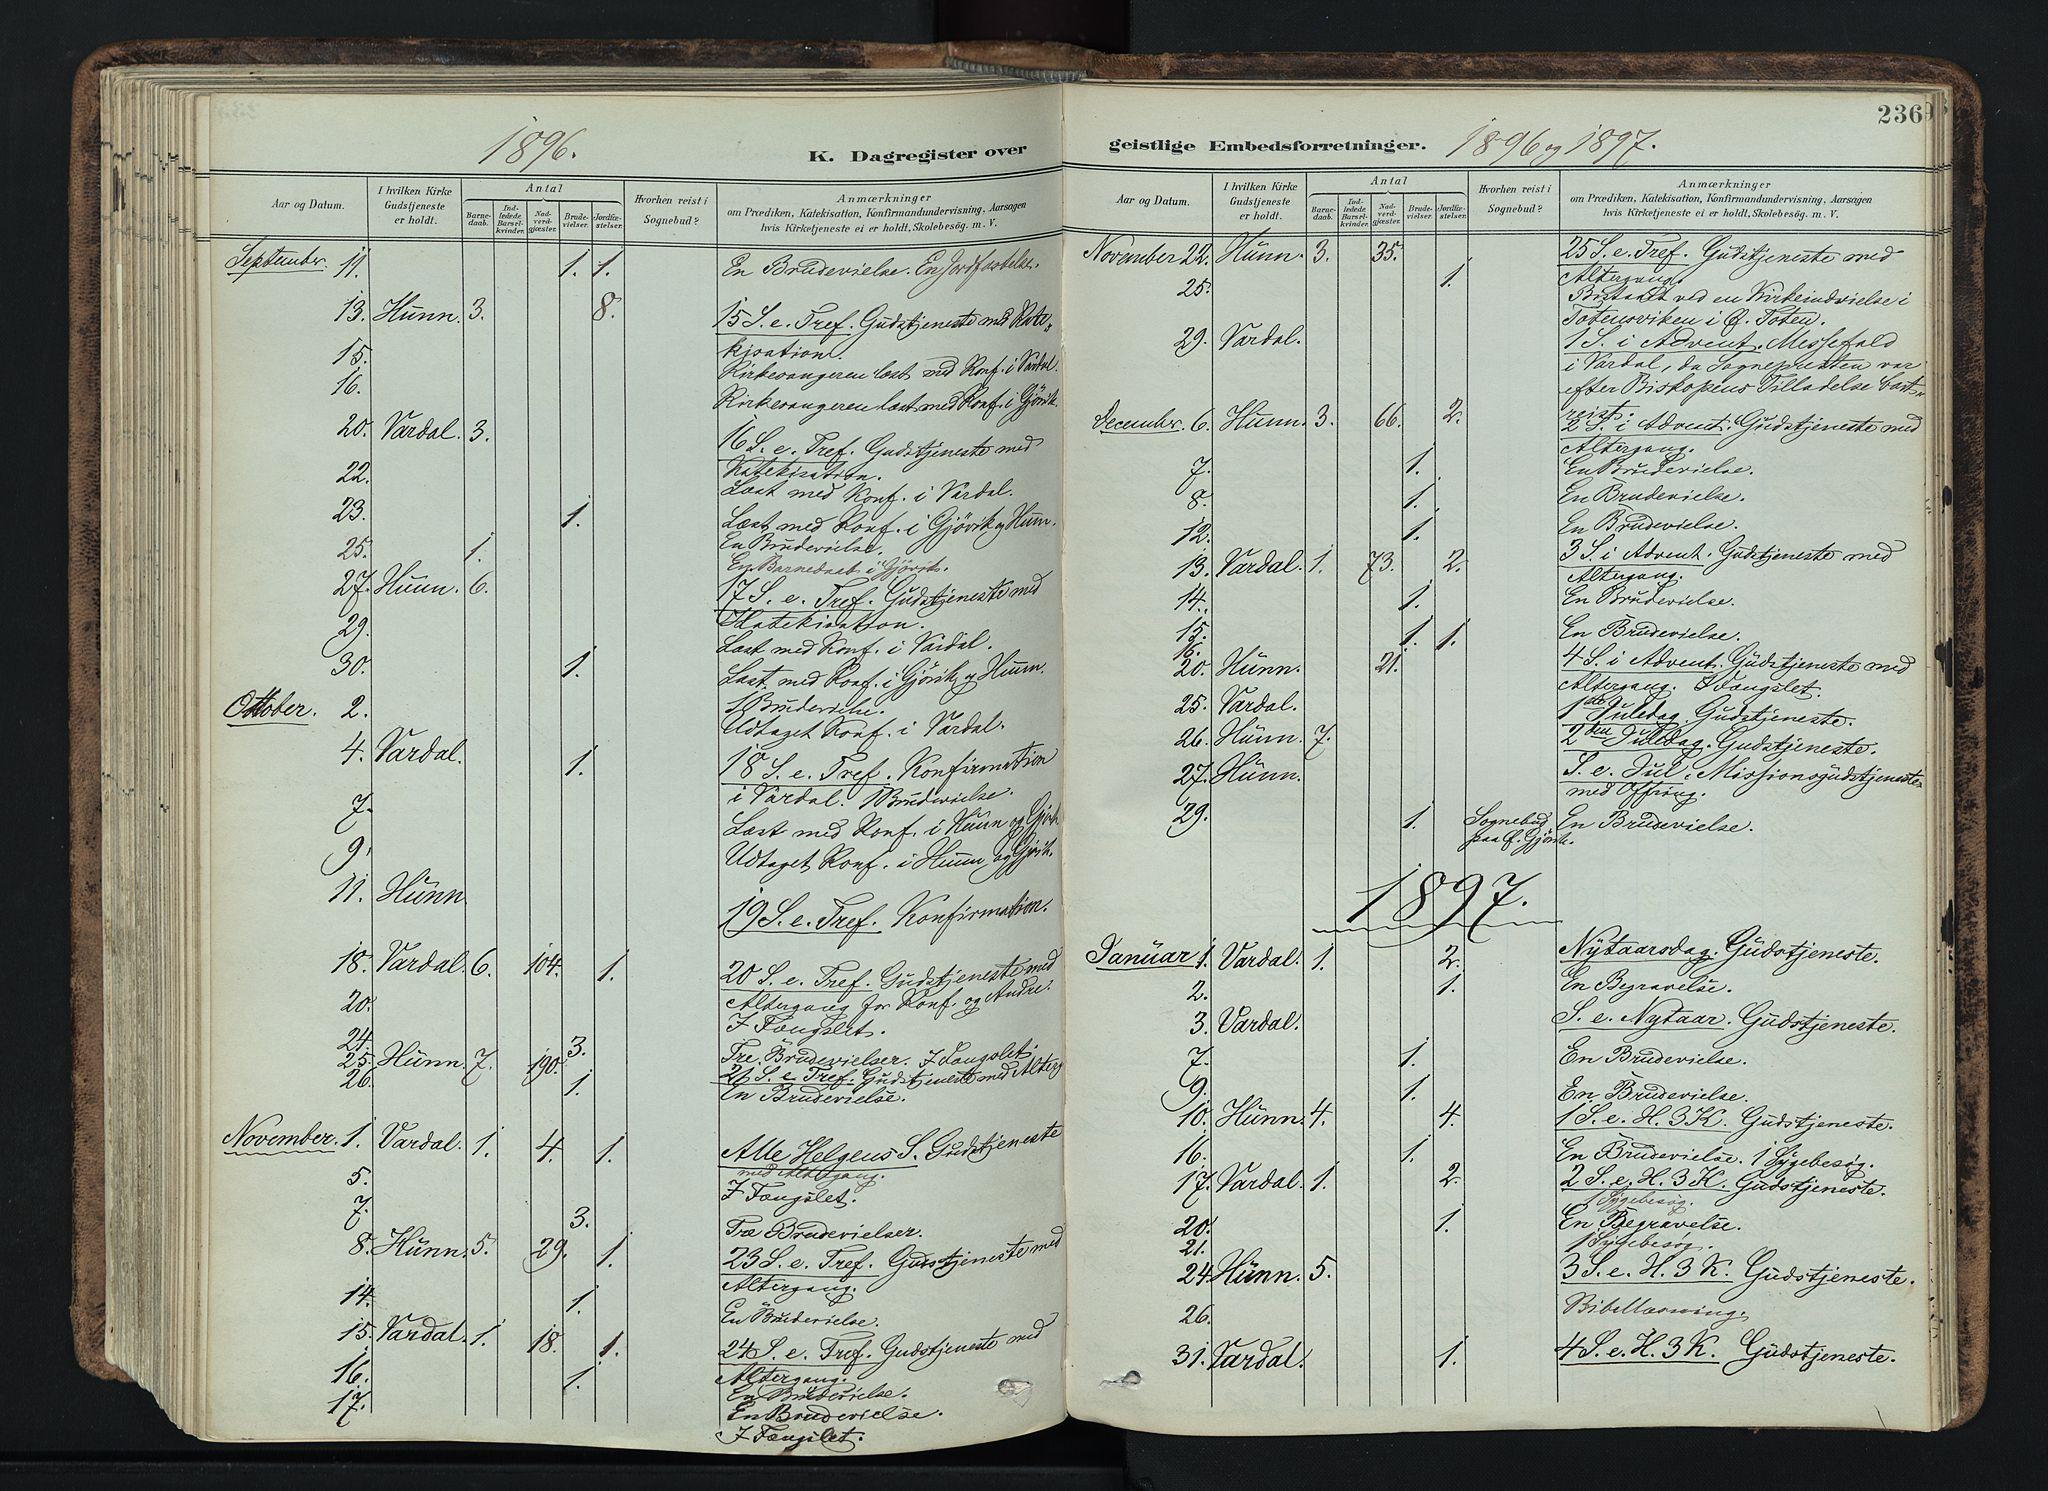 SAH, Vardal prestekontor, H/Ha/Haa/L0019: Ministerialbok nr. 19, 1893-1907, s. 236